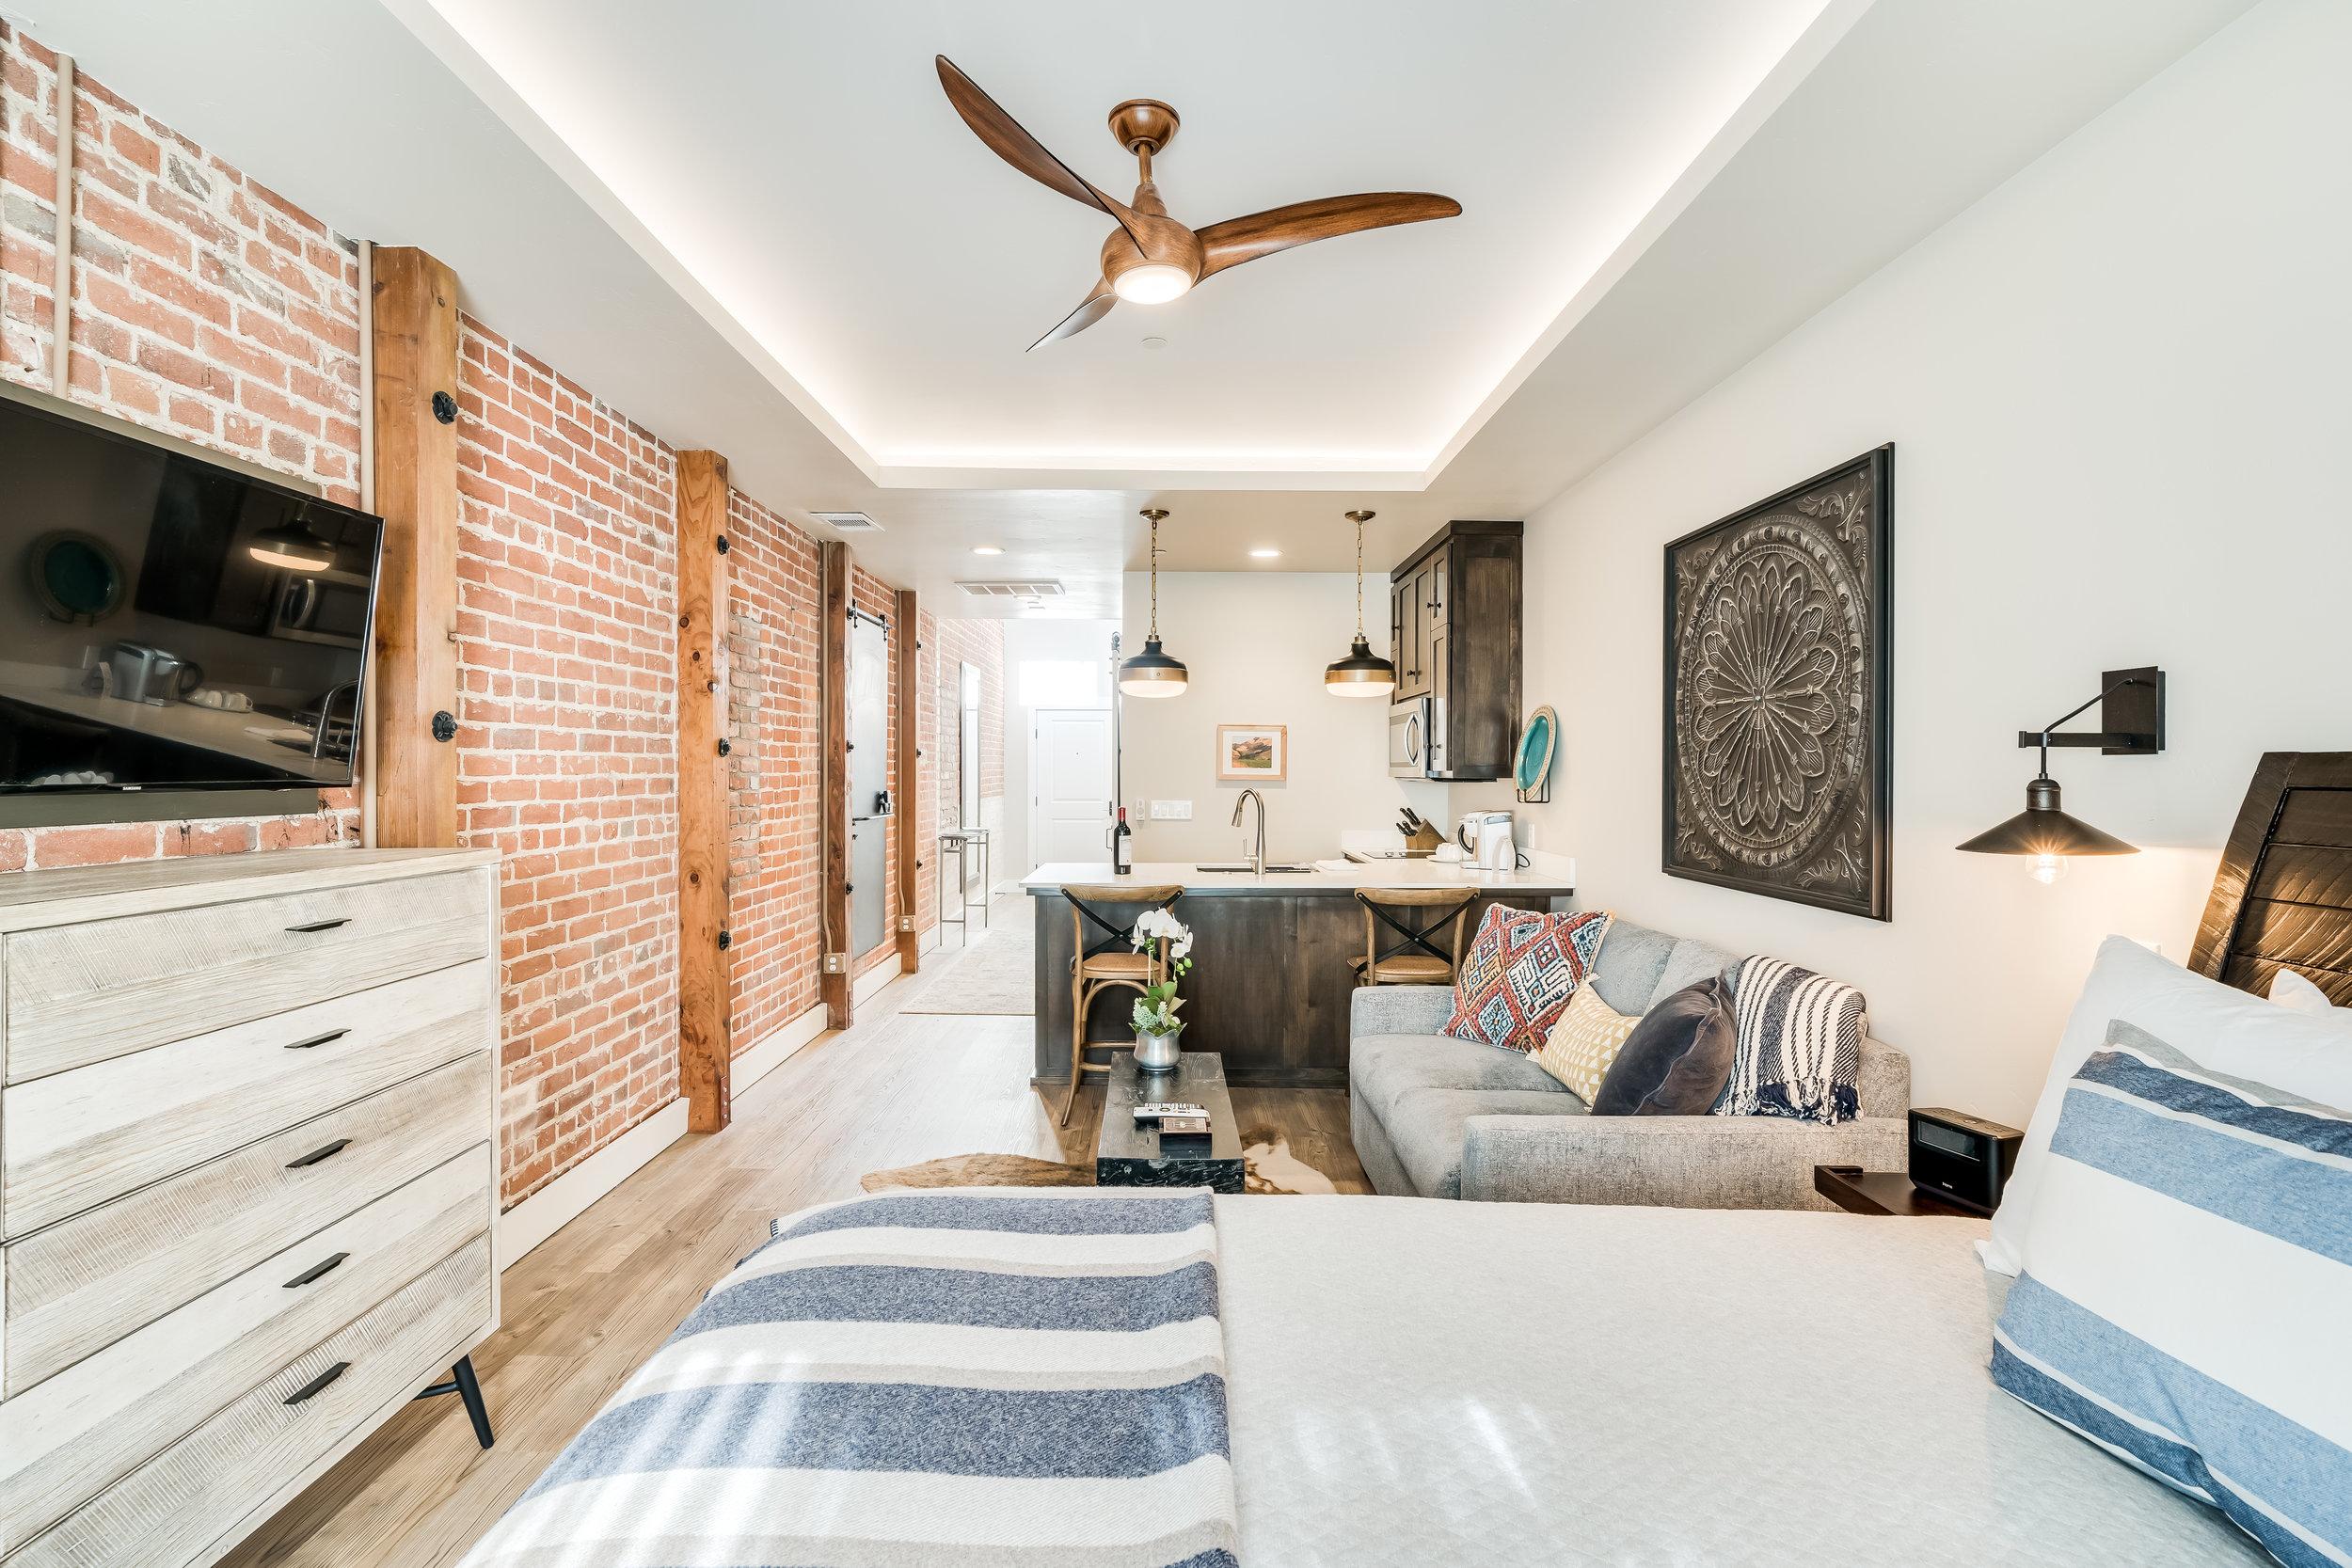 20181217_Airbnb01.jpg